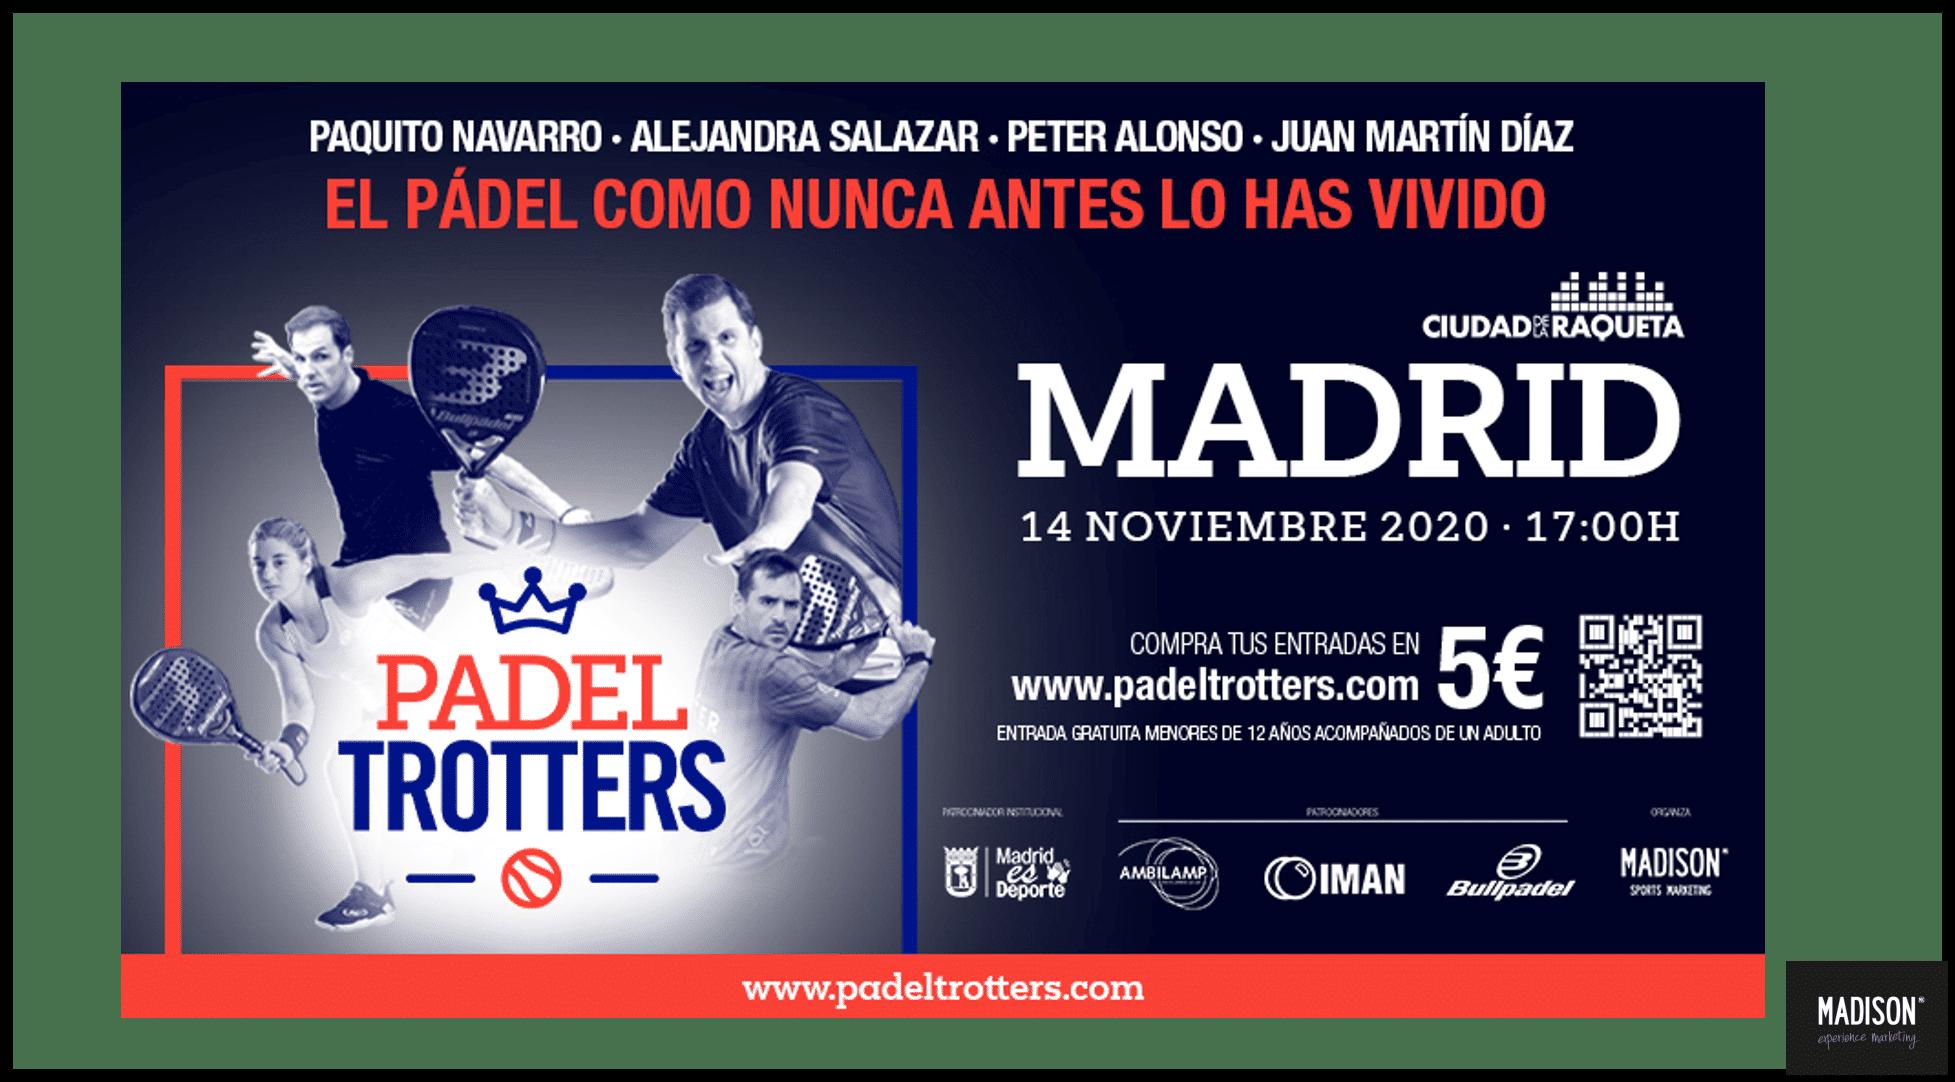 Padel Trotters madison